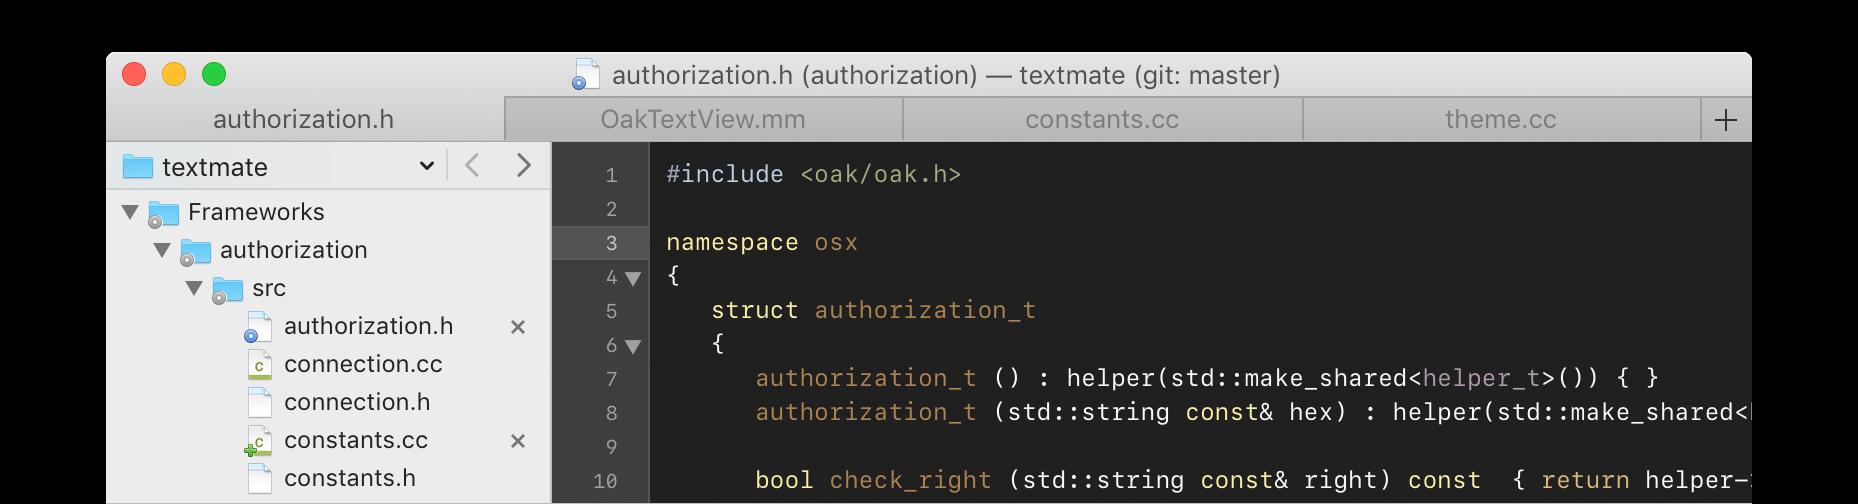 TextMate Mac 破解版 多用途的纯文本编辑器